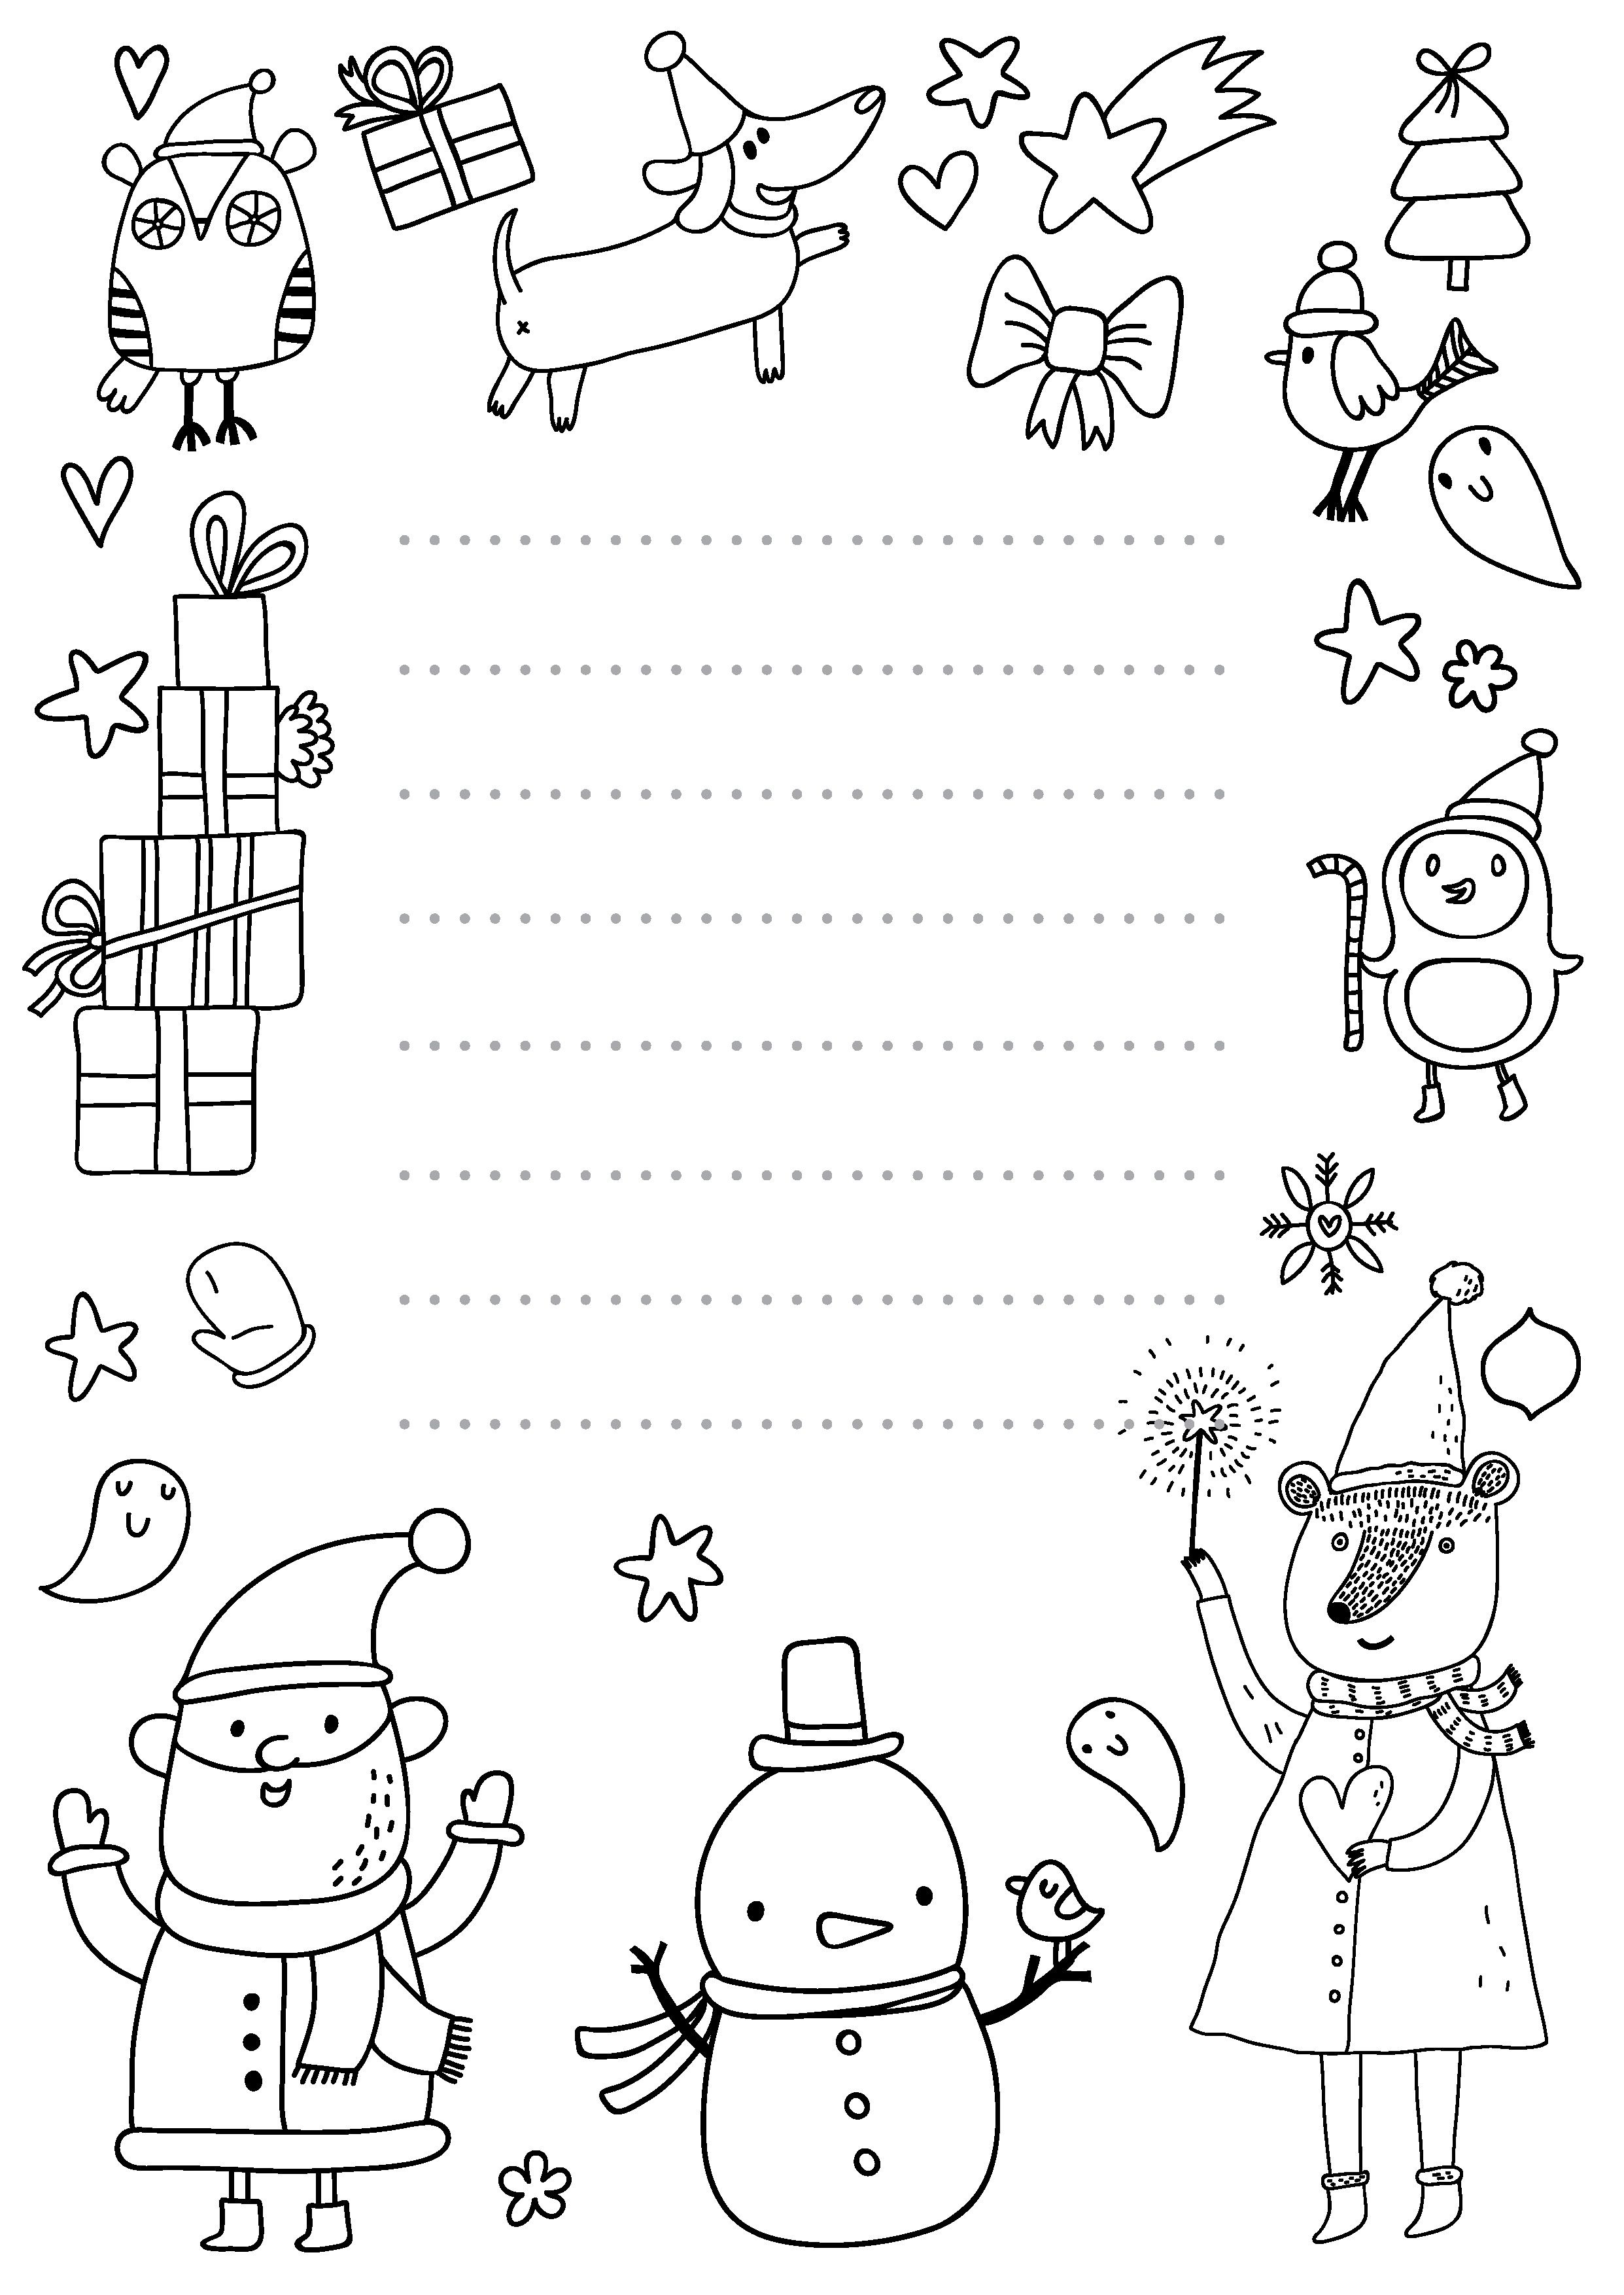 celebrate-picture-books-picture-book-review-dear-santa-letter-page